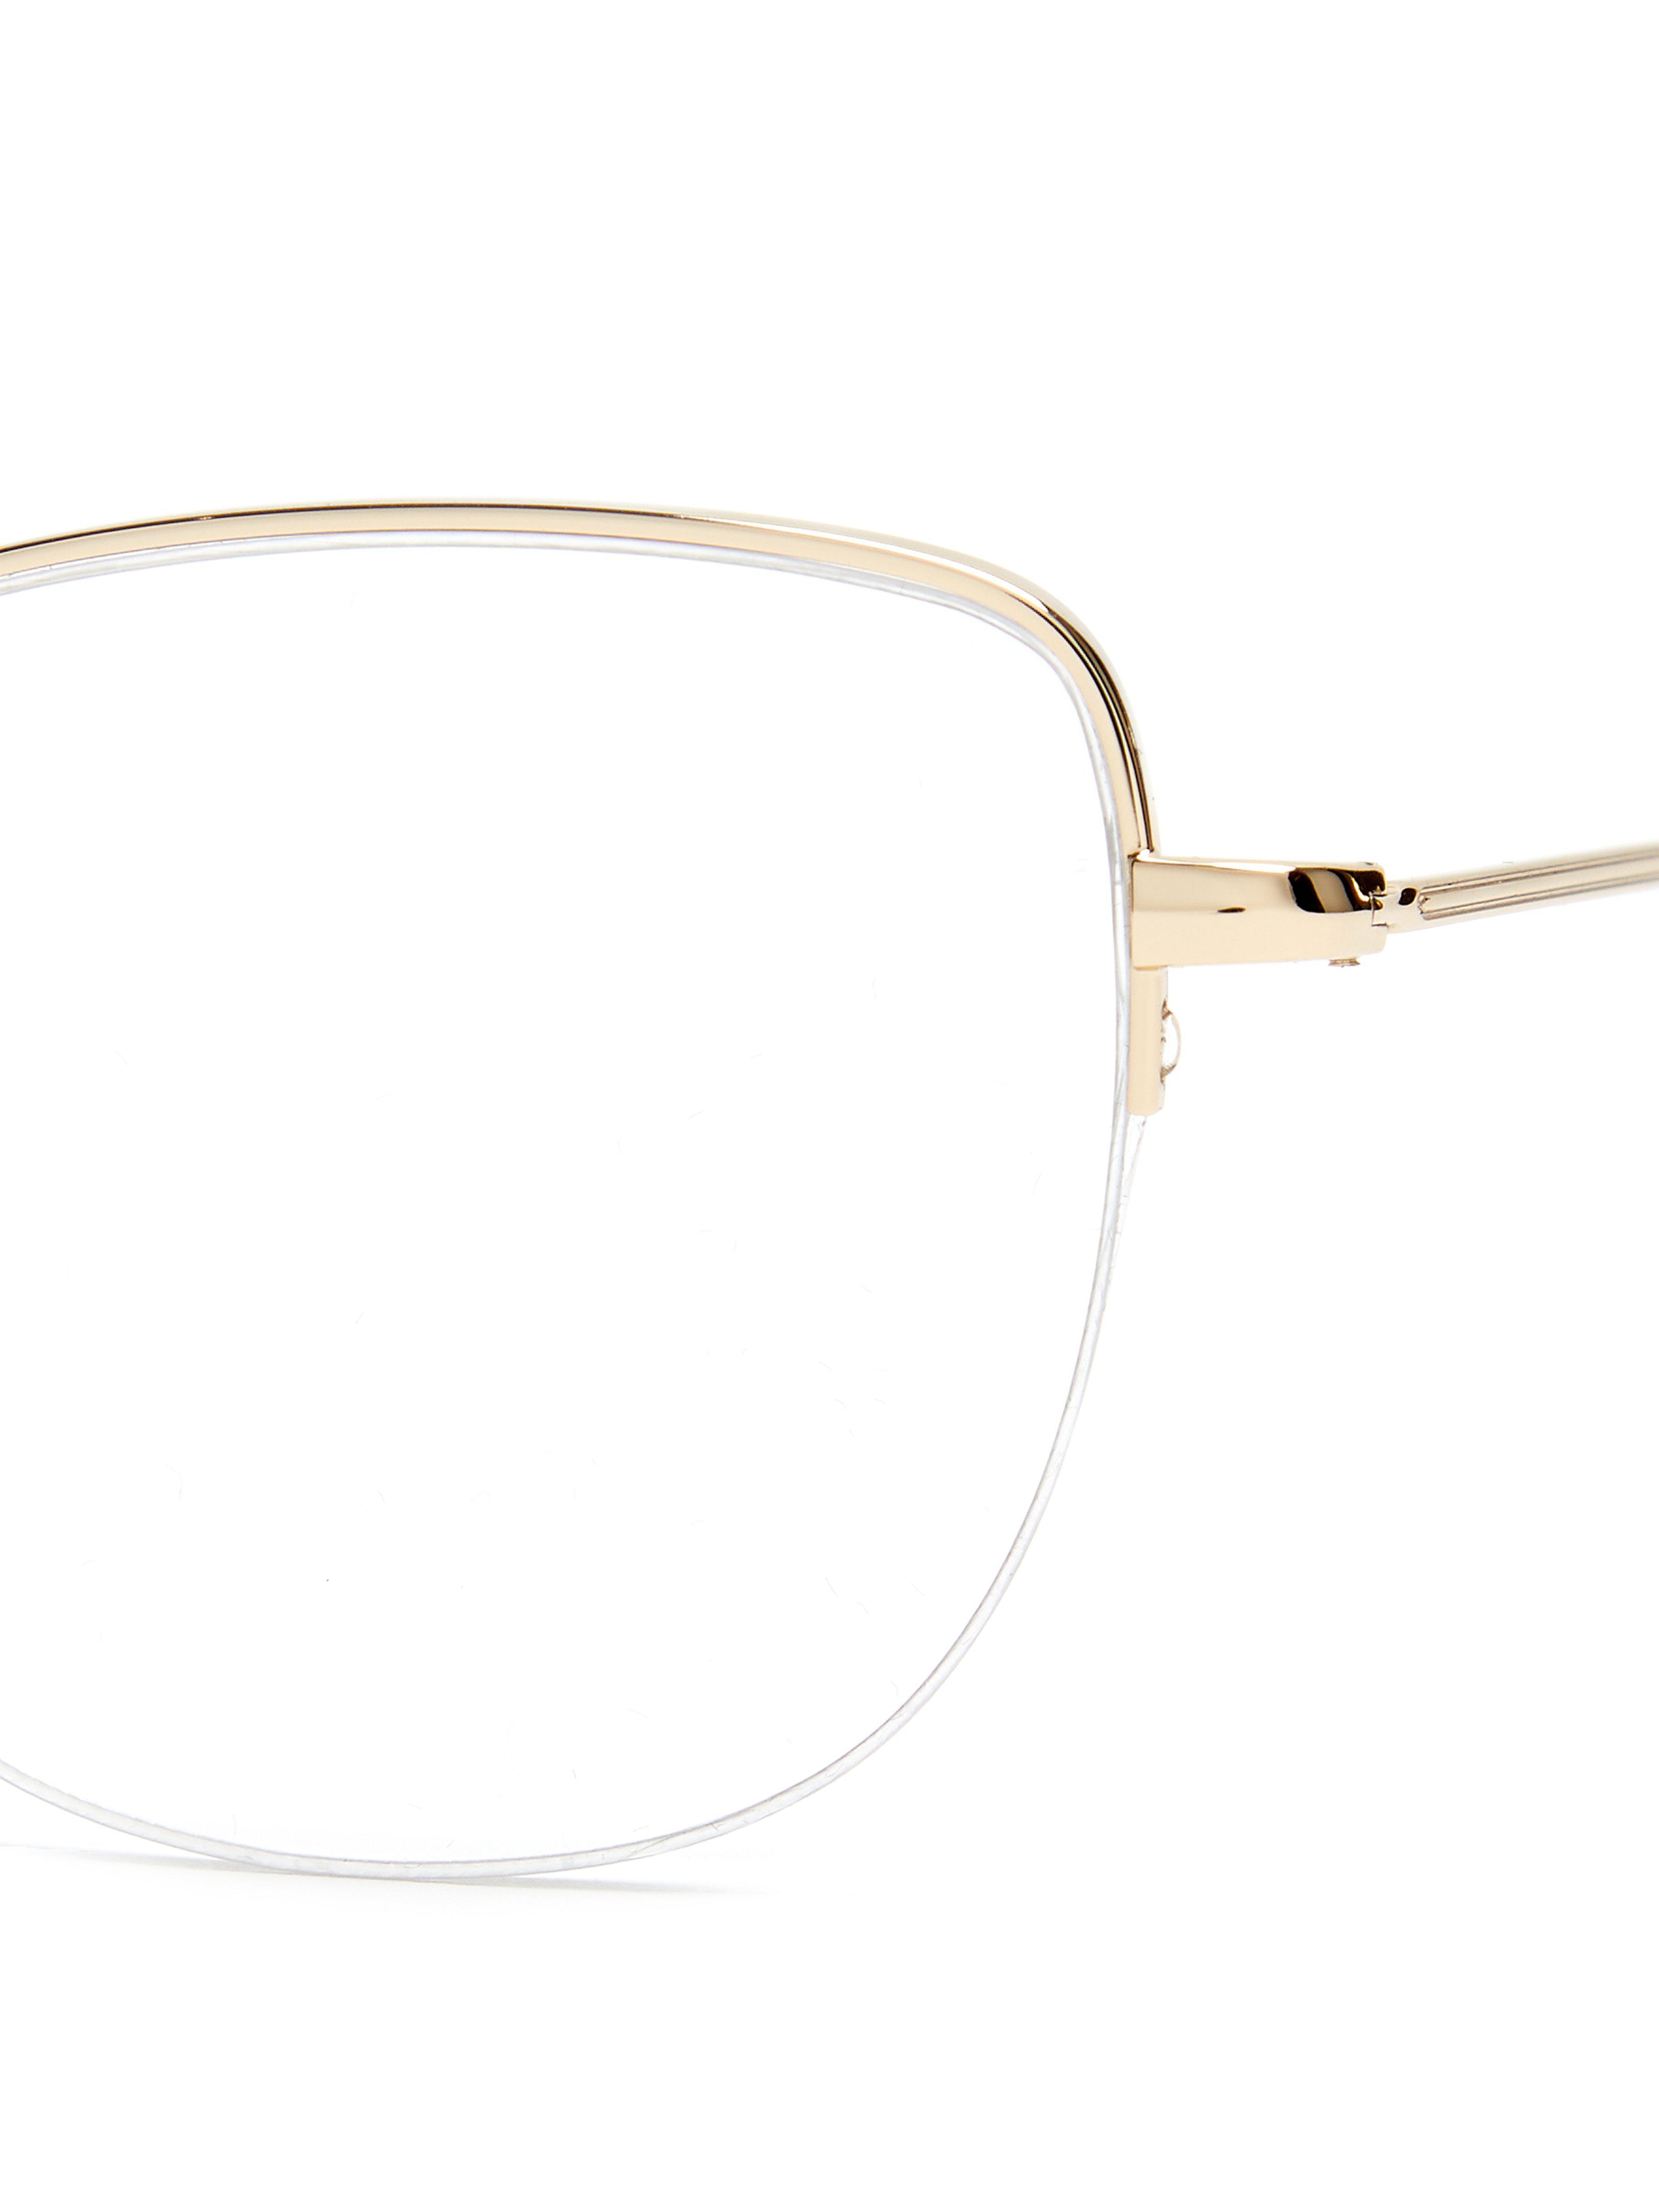 4c84bb1c46f Garrett Leight Pershing 54 Square Frame Glasses - Lyst